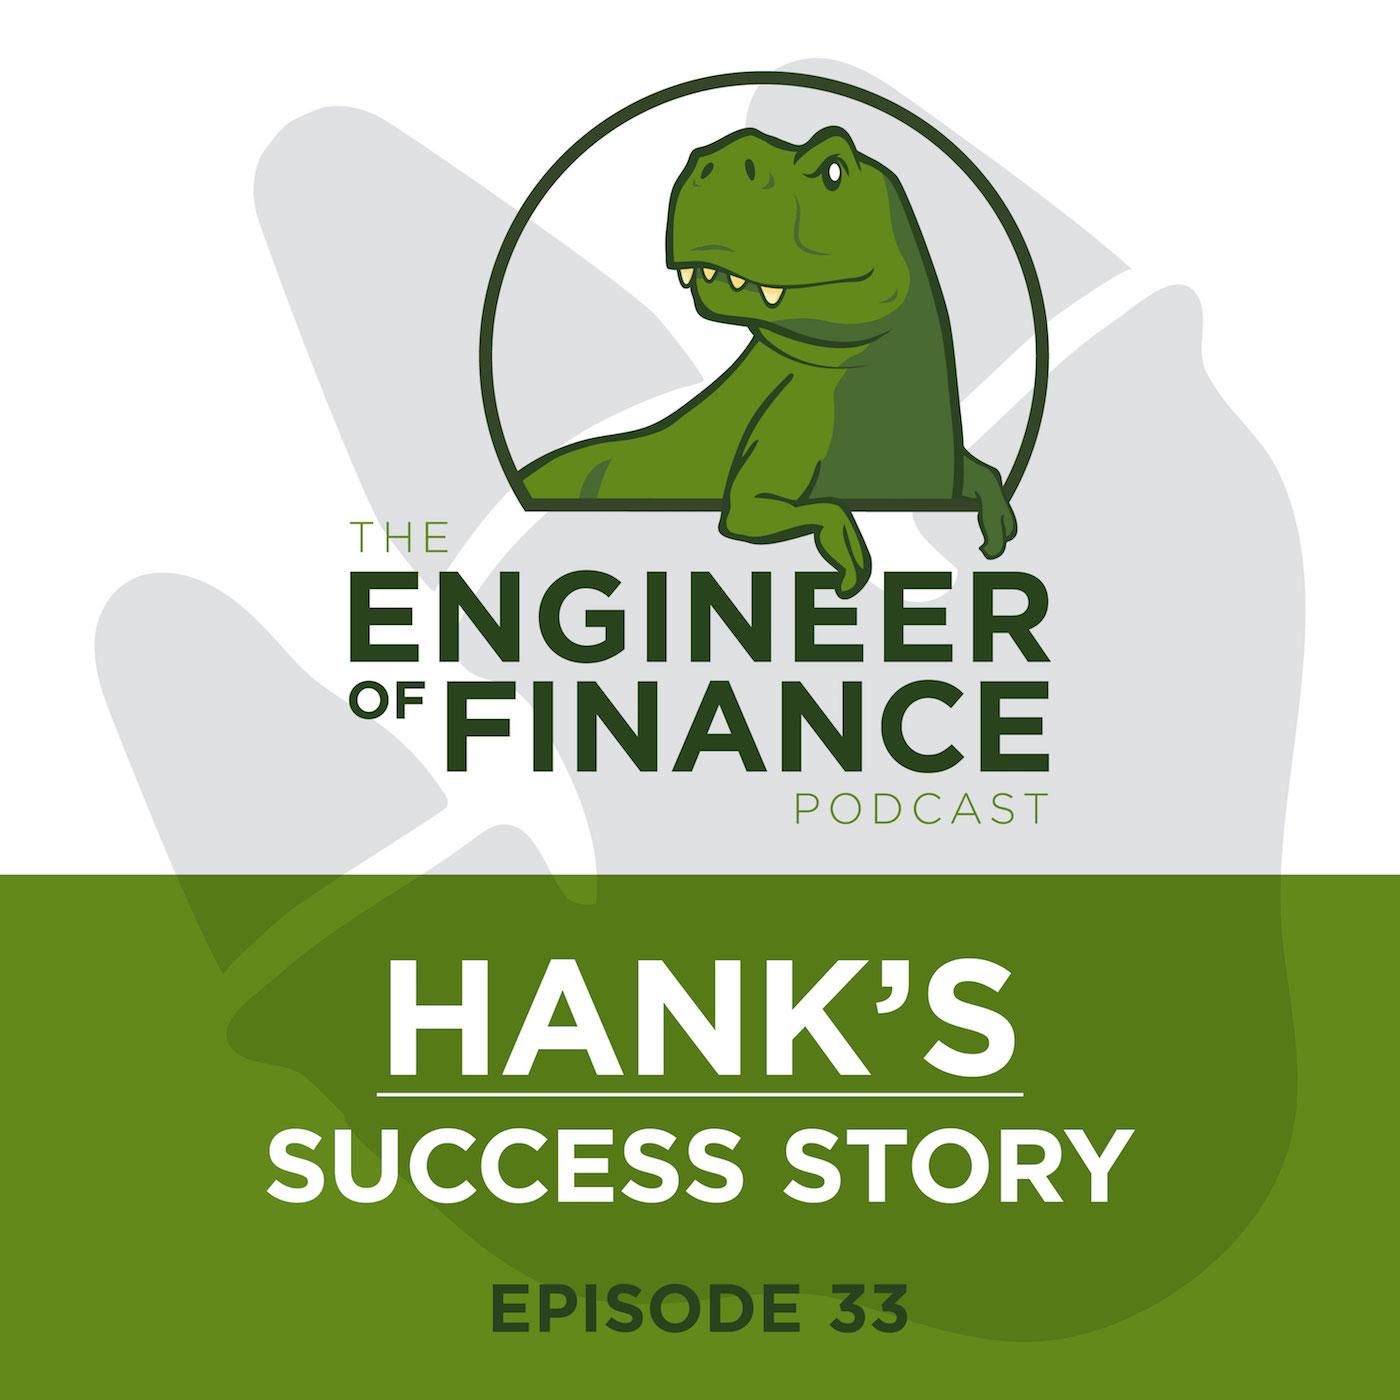 Hank's Success Story – Episode 33